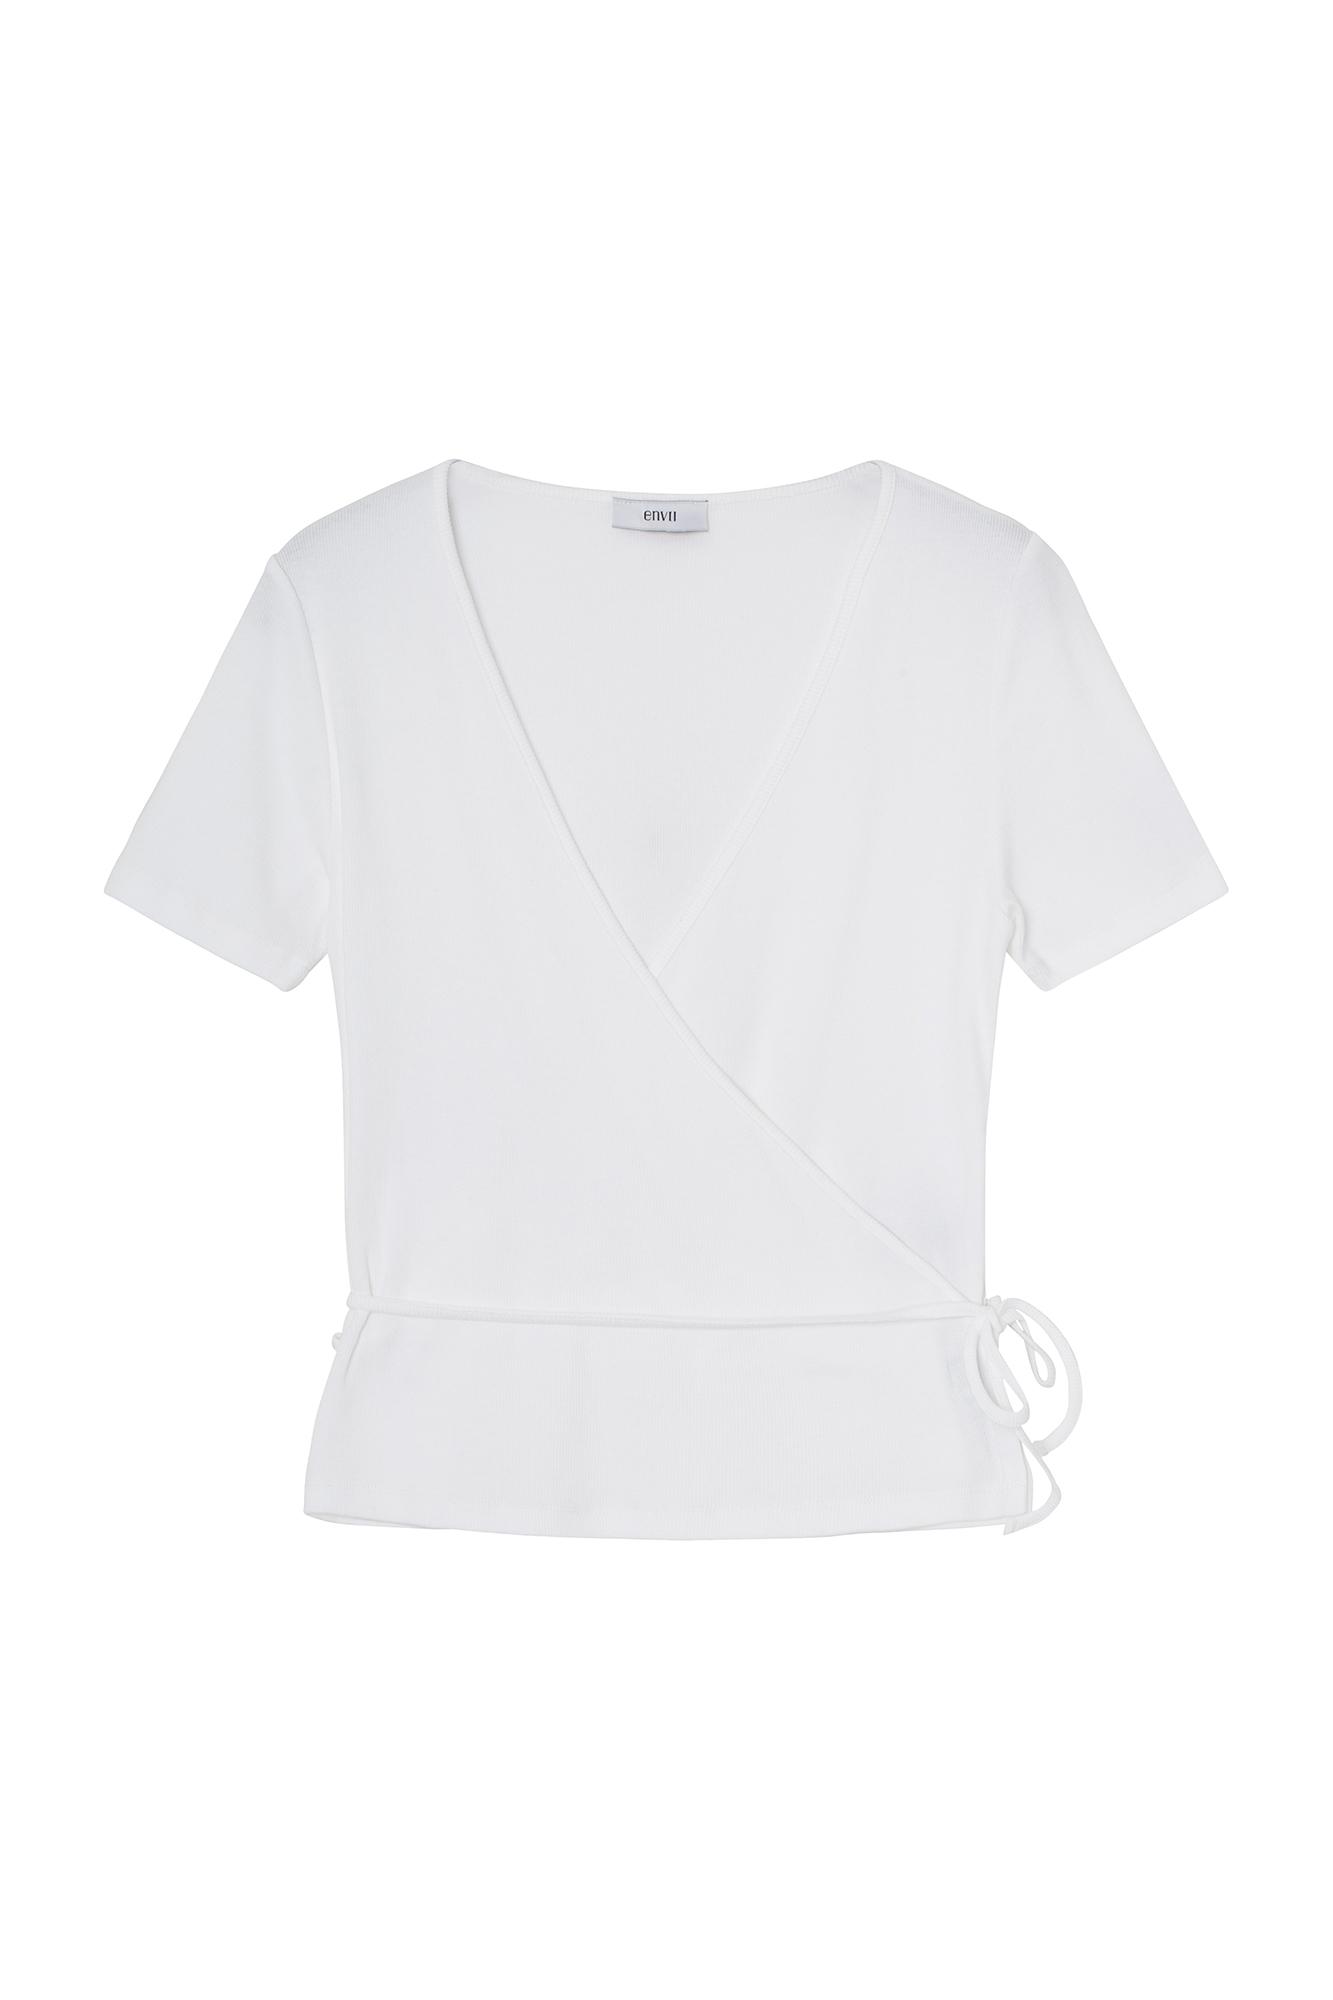 Envii Enally t-shirt, white, small